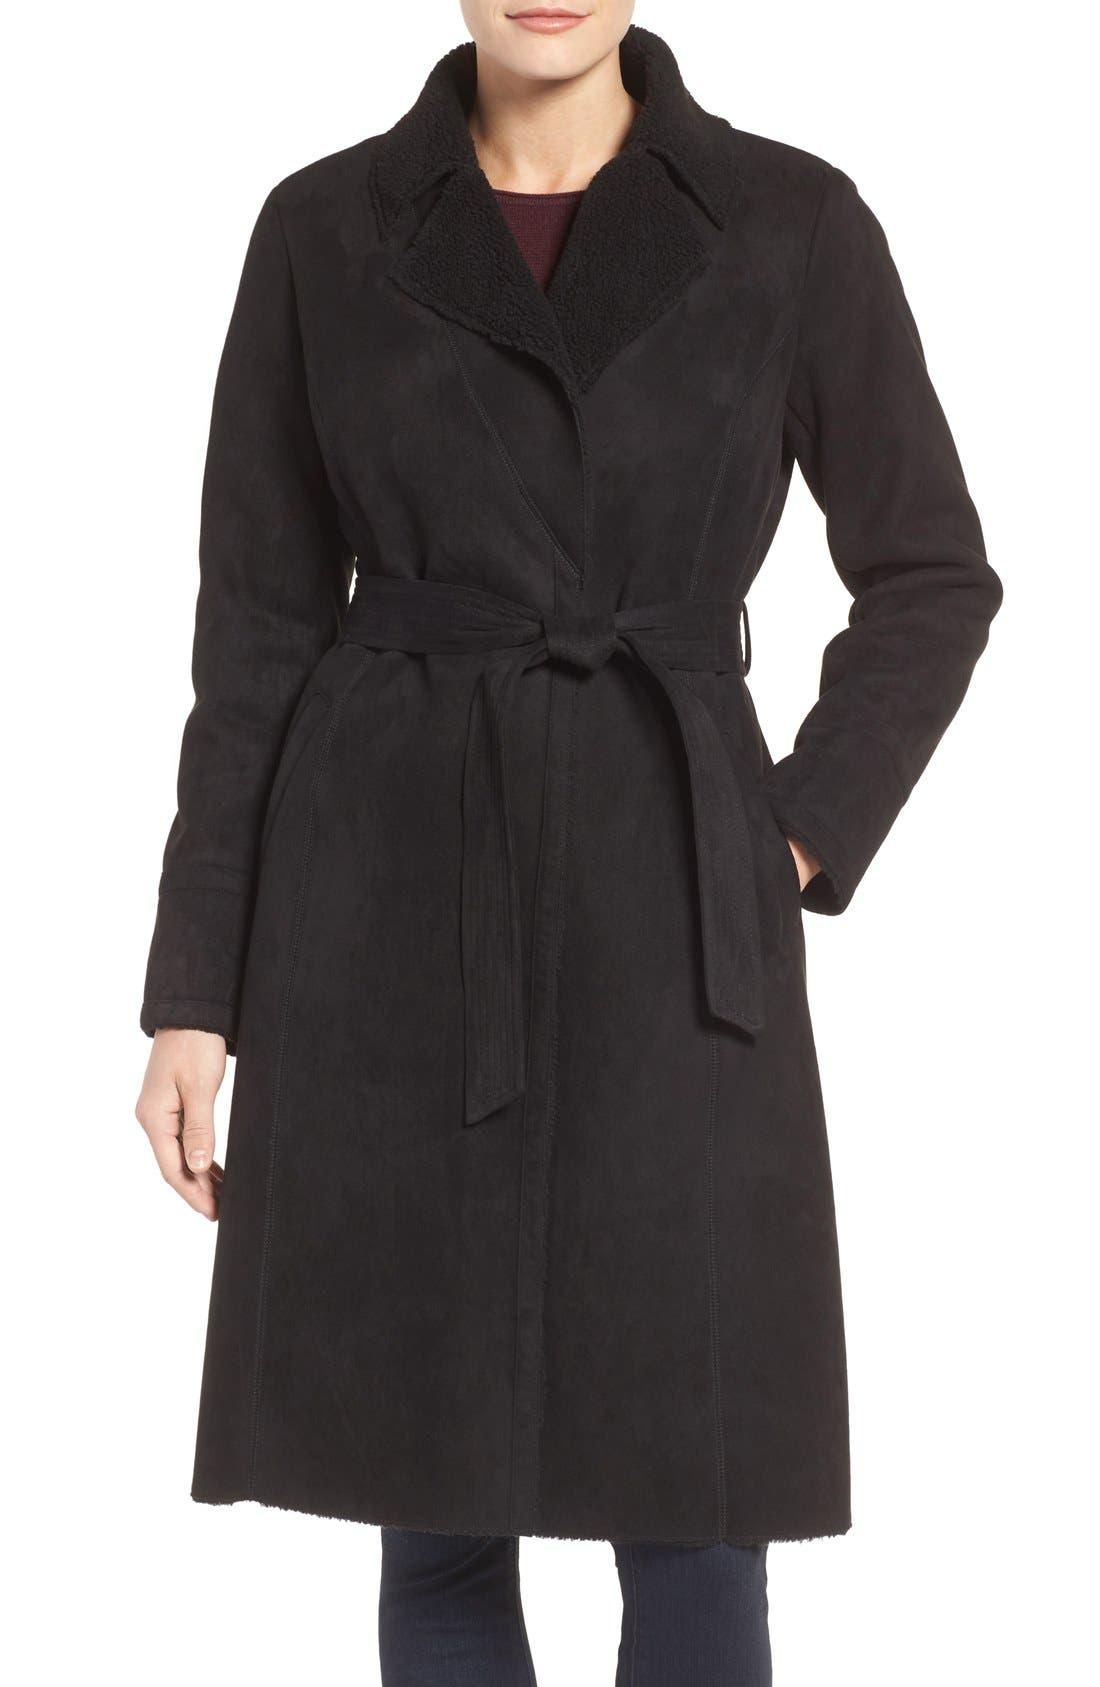 Faux Shearling Wrap Trench Coat,                             Main thumbnail 1, color,                             Black